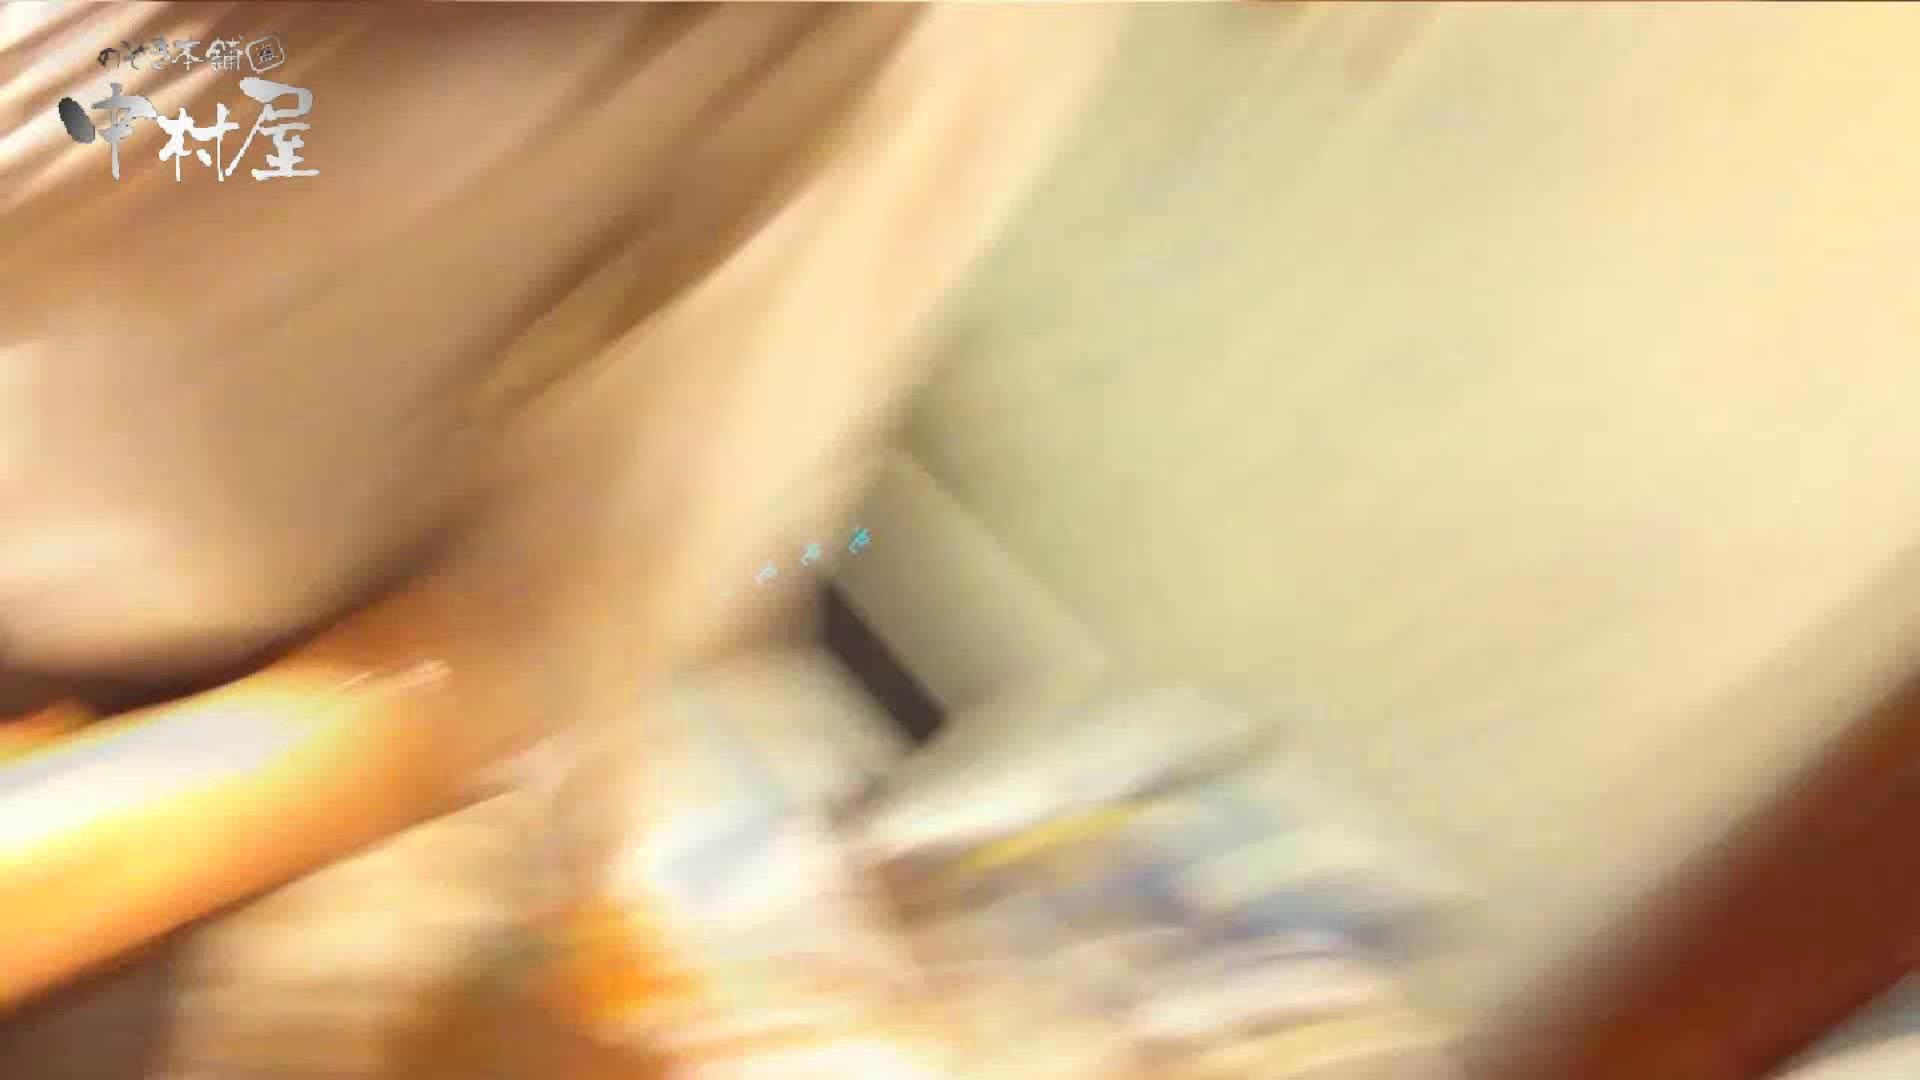 vol.45 可愛いカリスマ店員限定‼胸チラ&パンチラ 食い込みミッキーマウス! 胸チラ ぱこり動画紹介 63画像 5